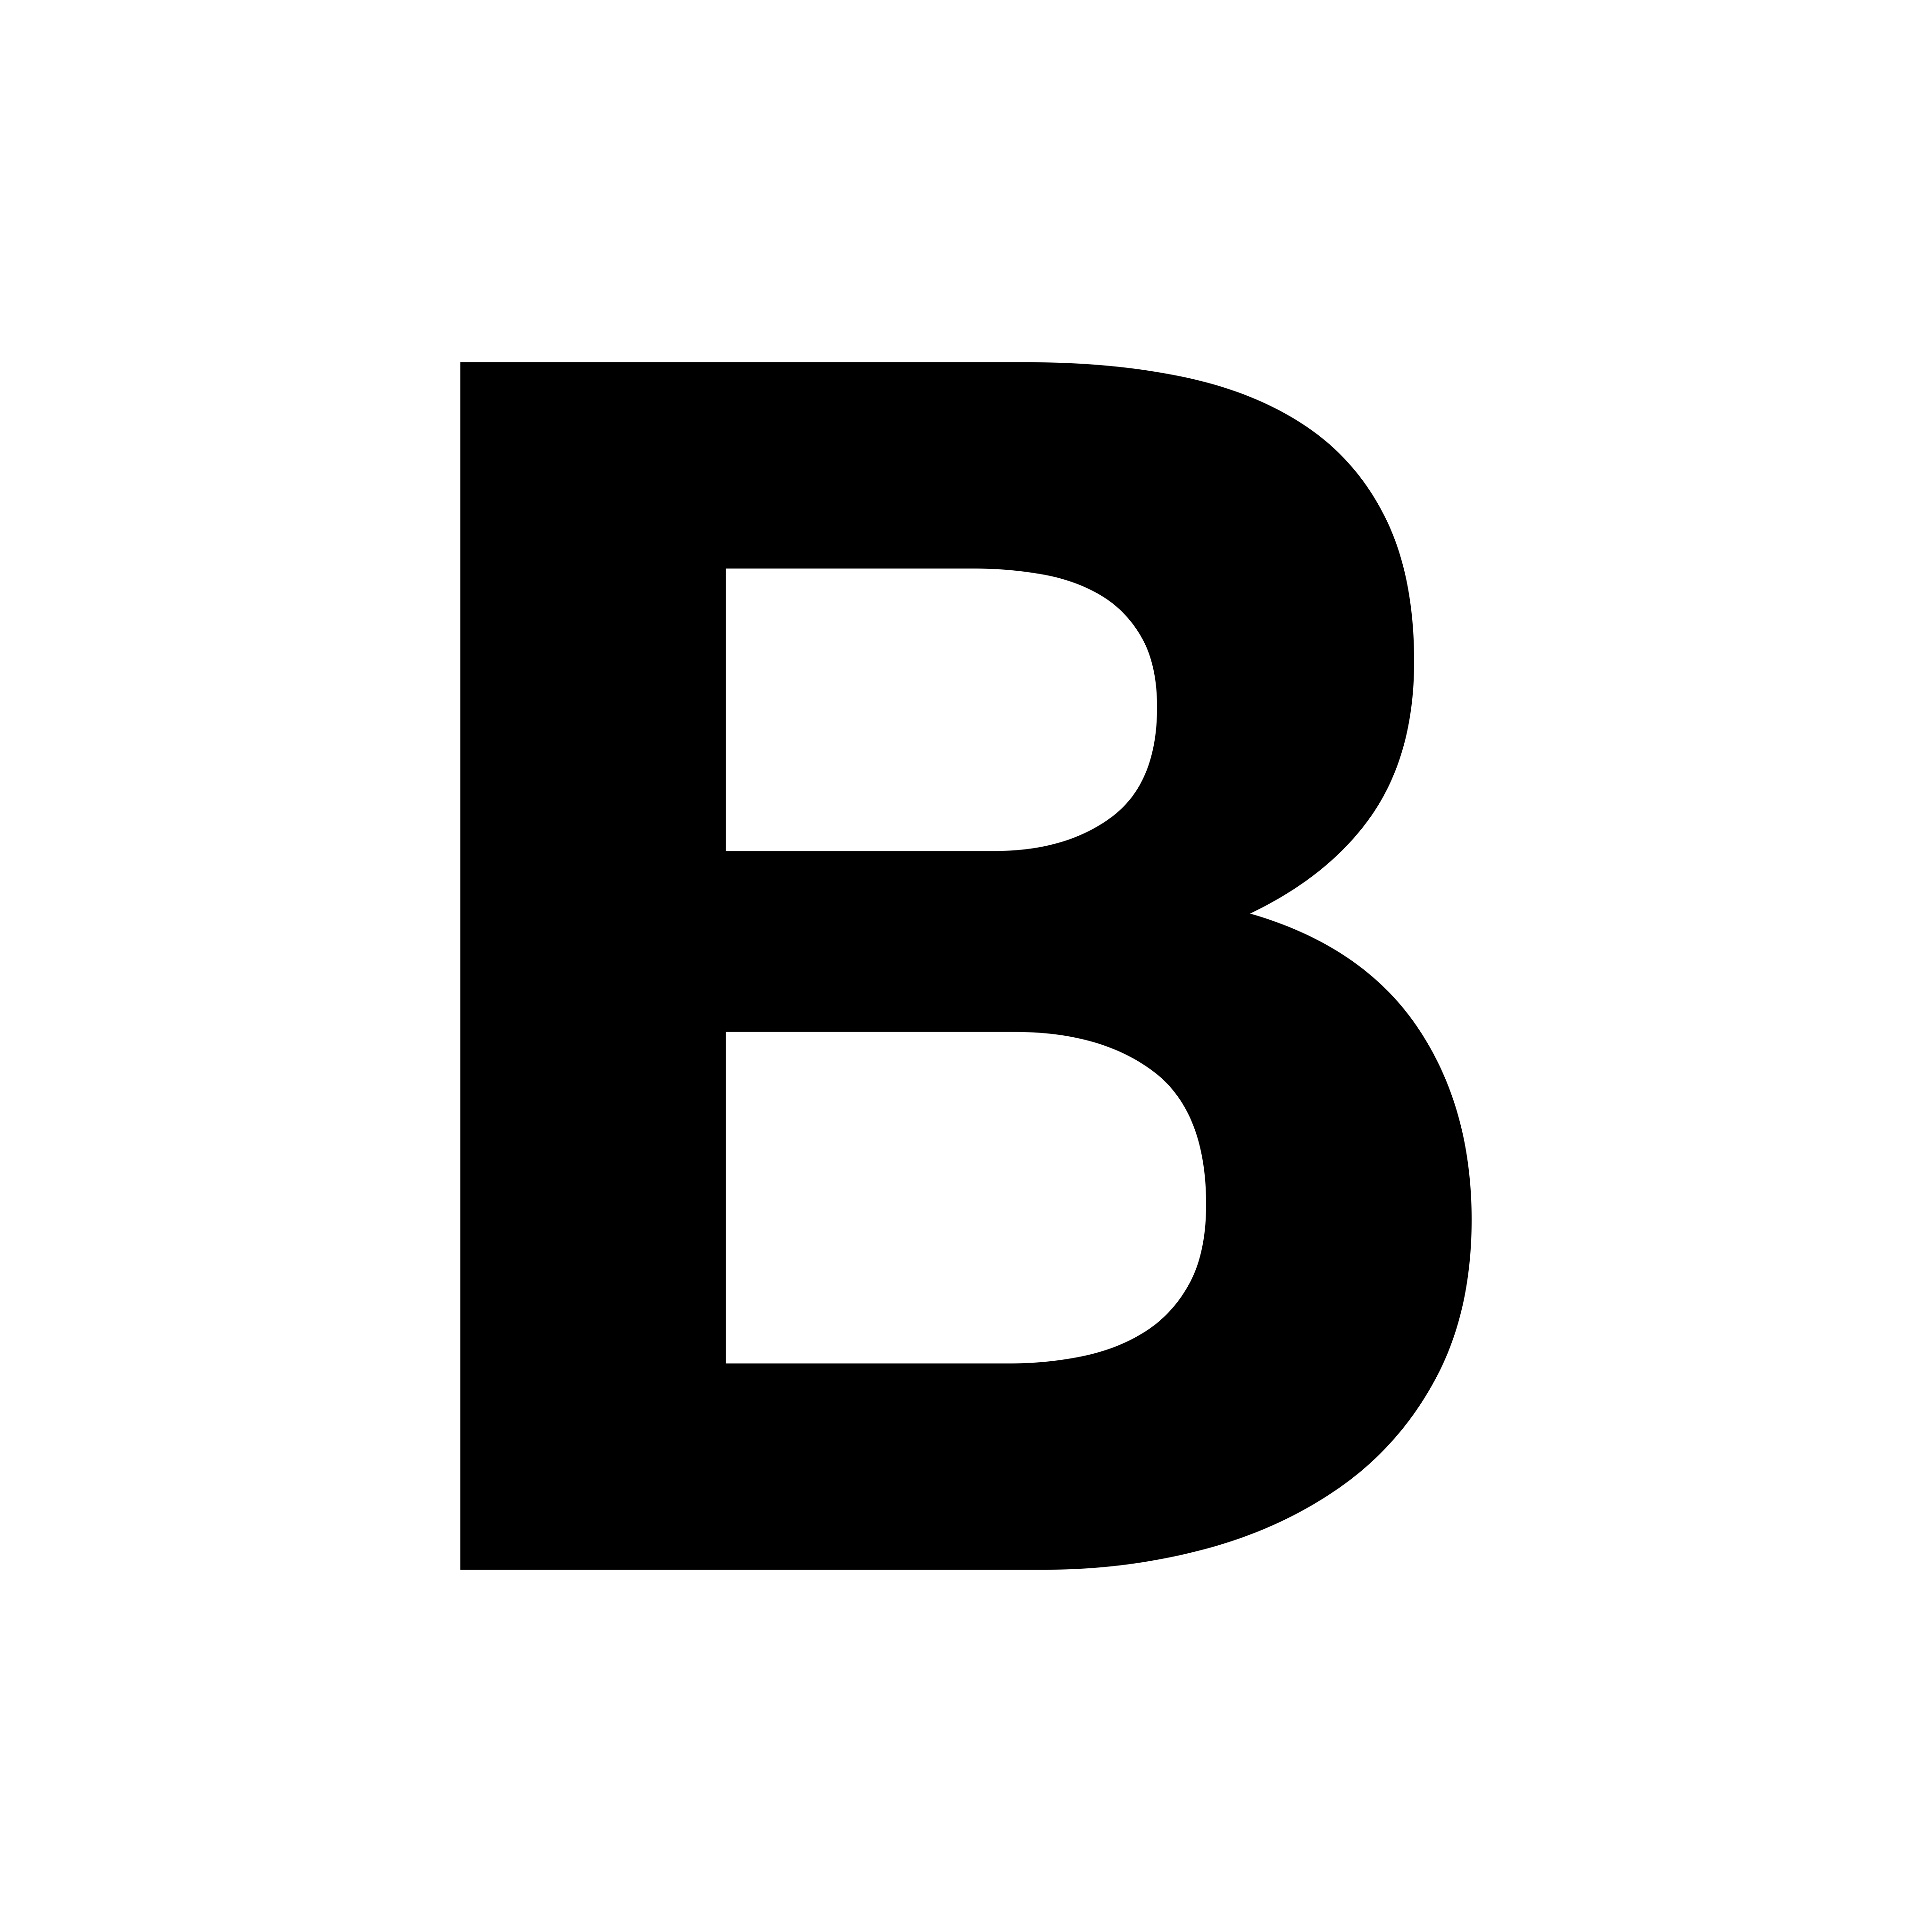 bootstrap,black - Bootstrap Logo Vector PNG